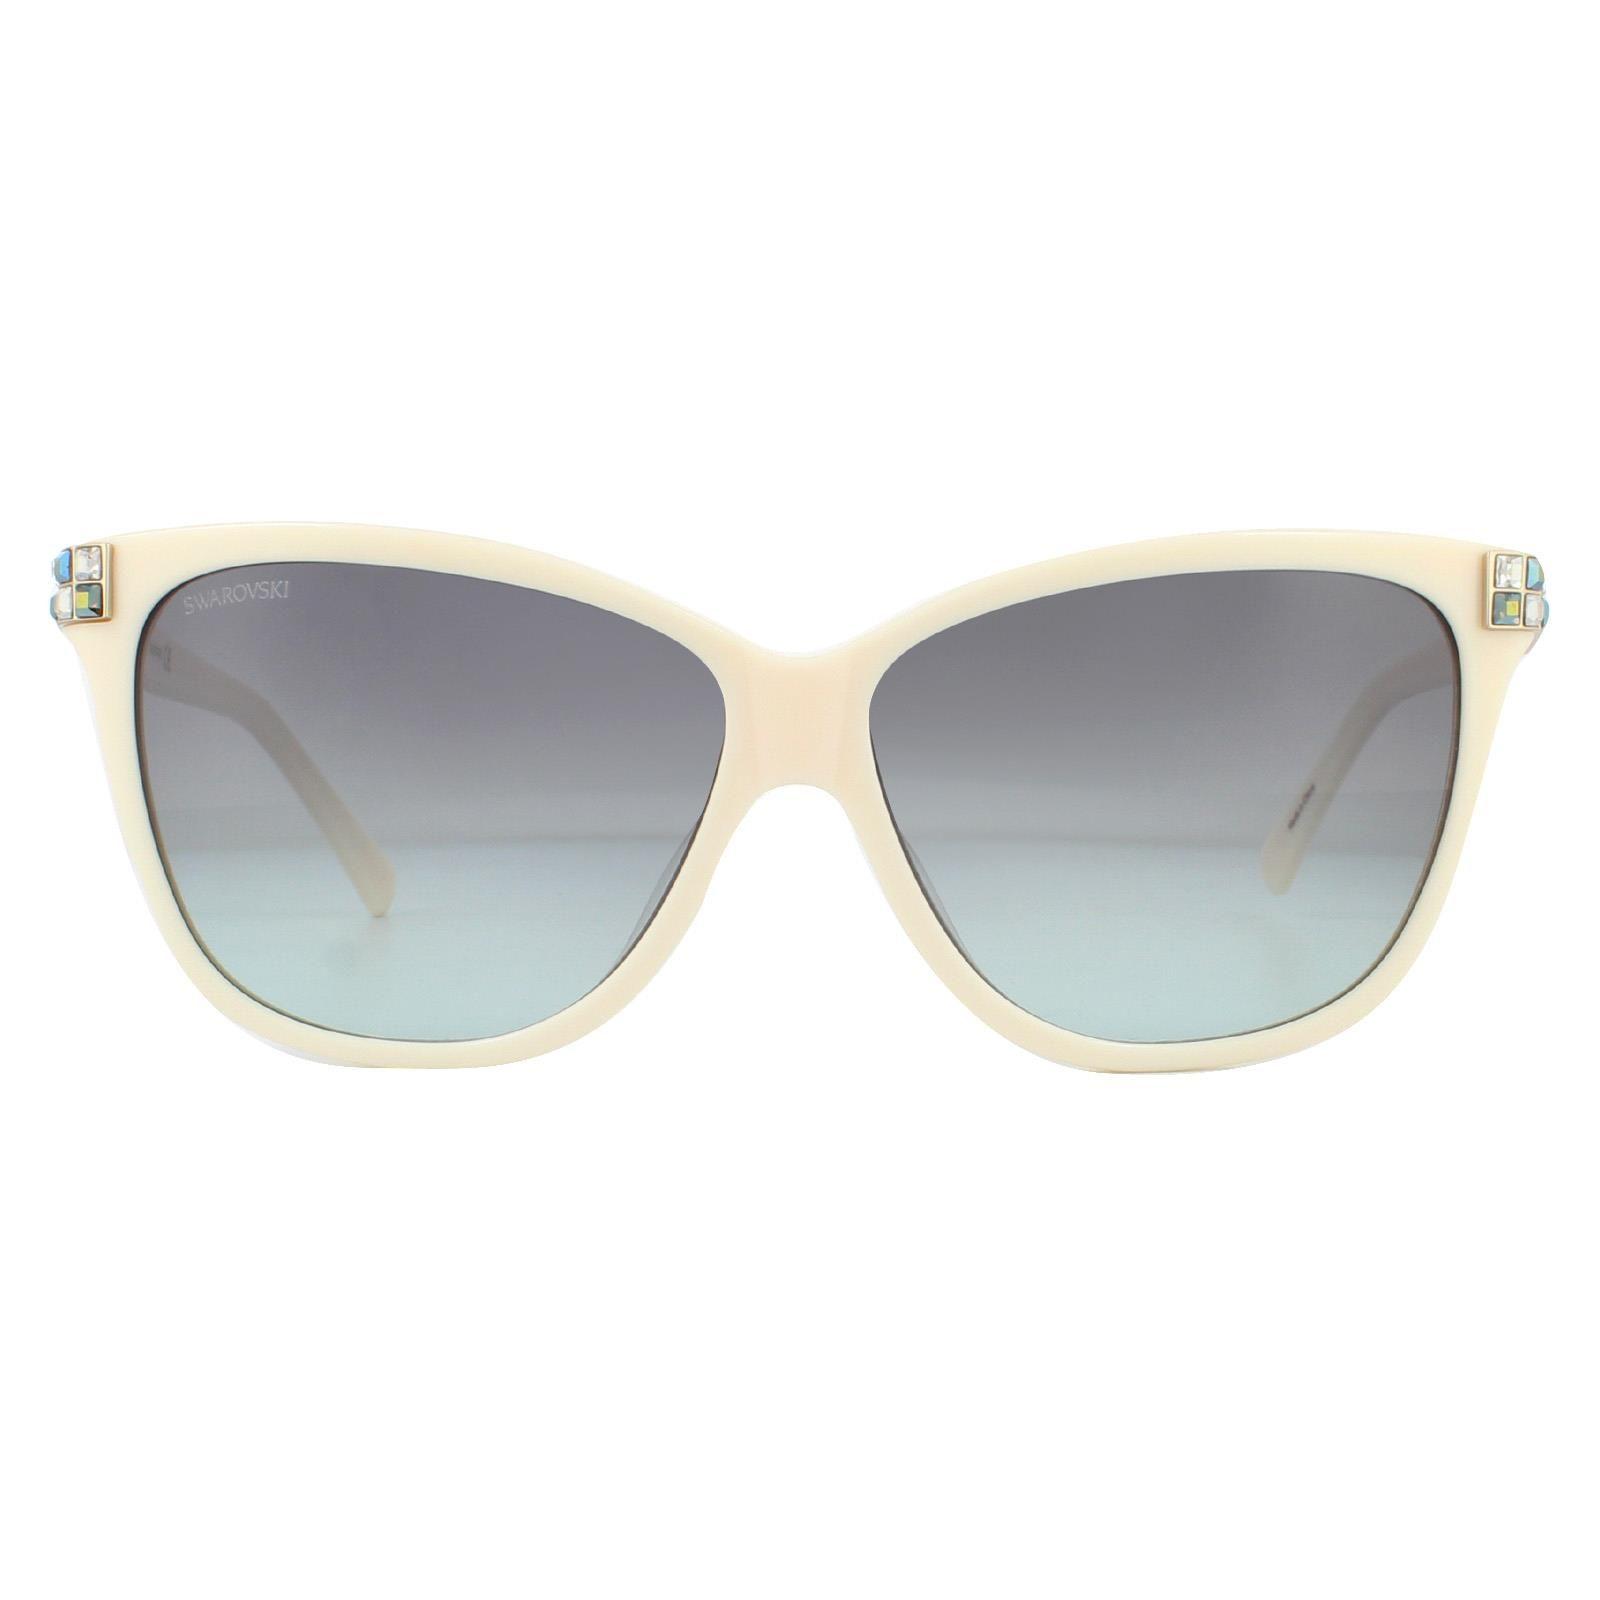 Swarovski Sunglasses SK0137 57B Shiny Beige Gradient Smoke